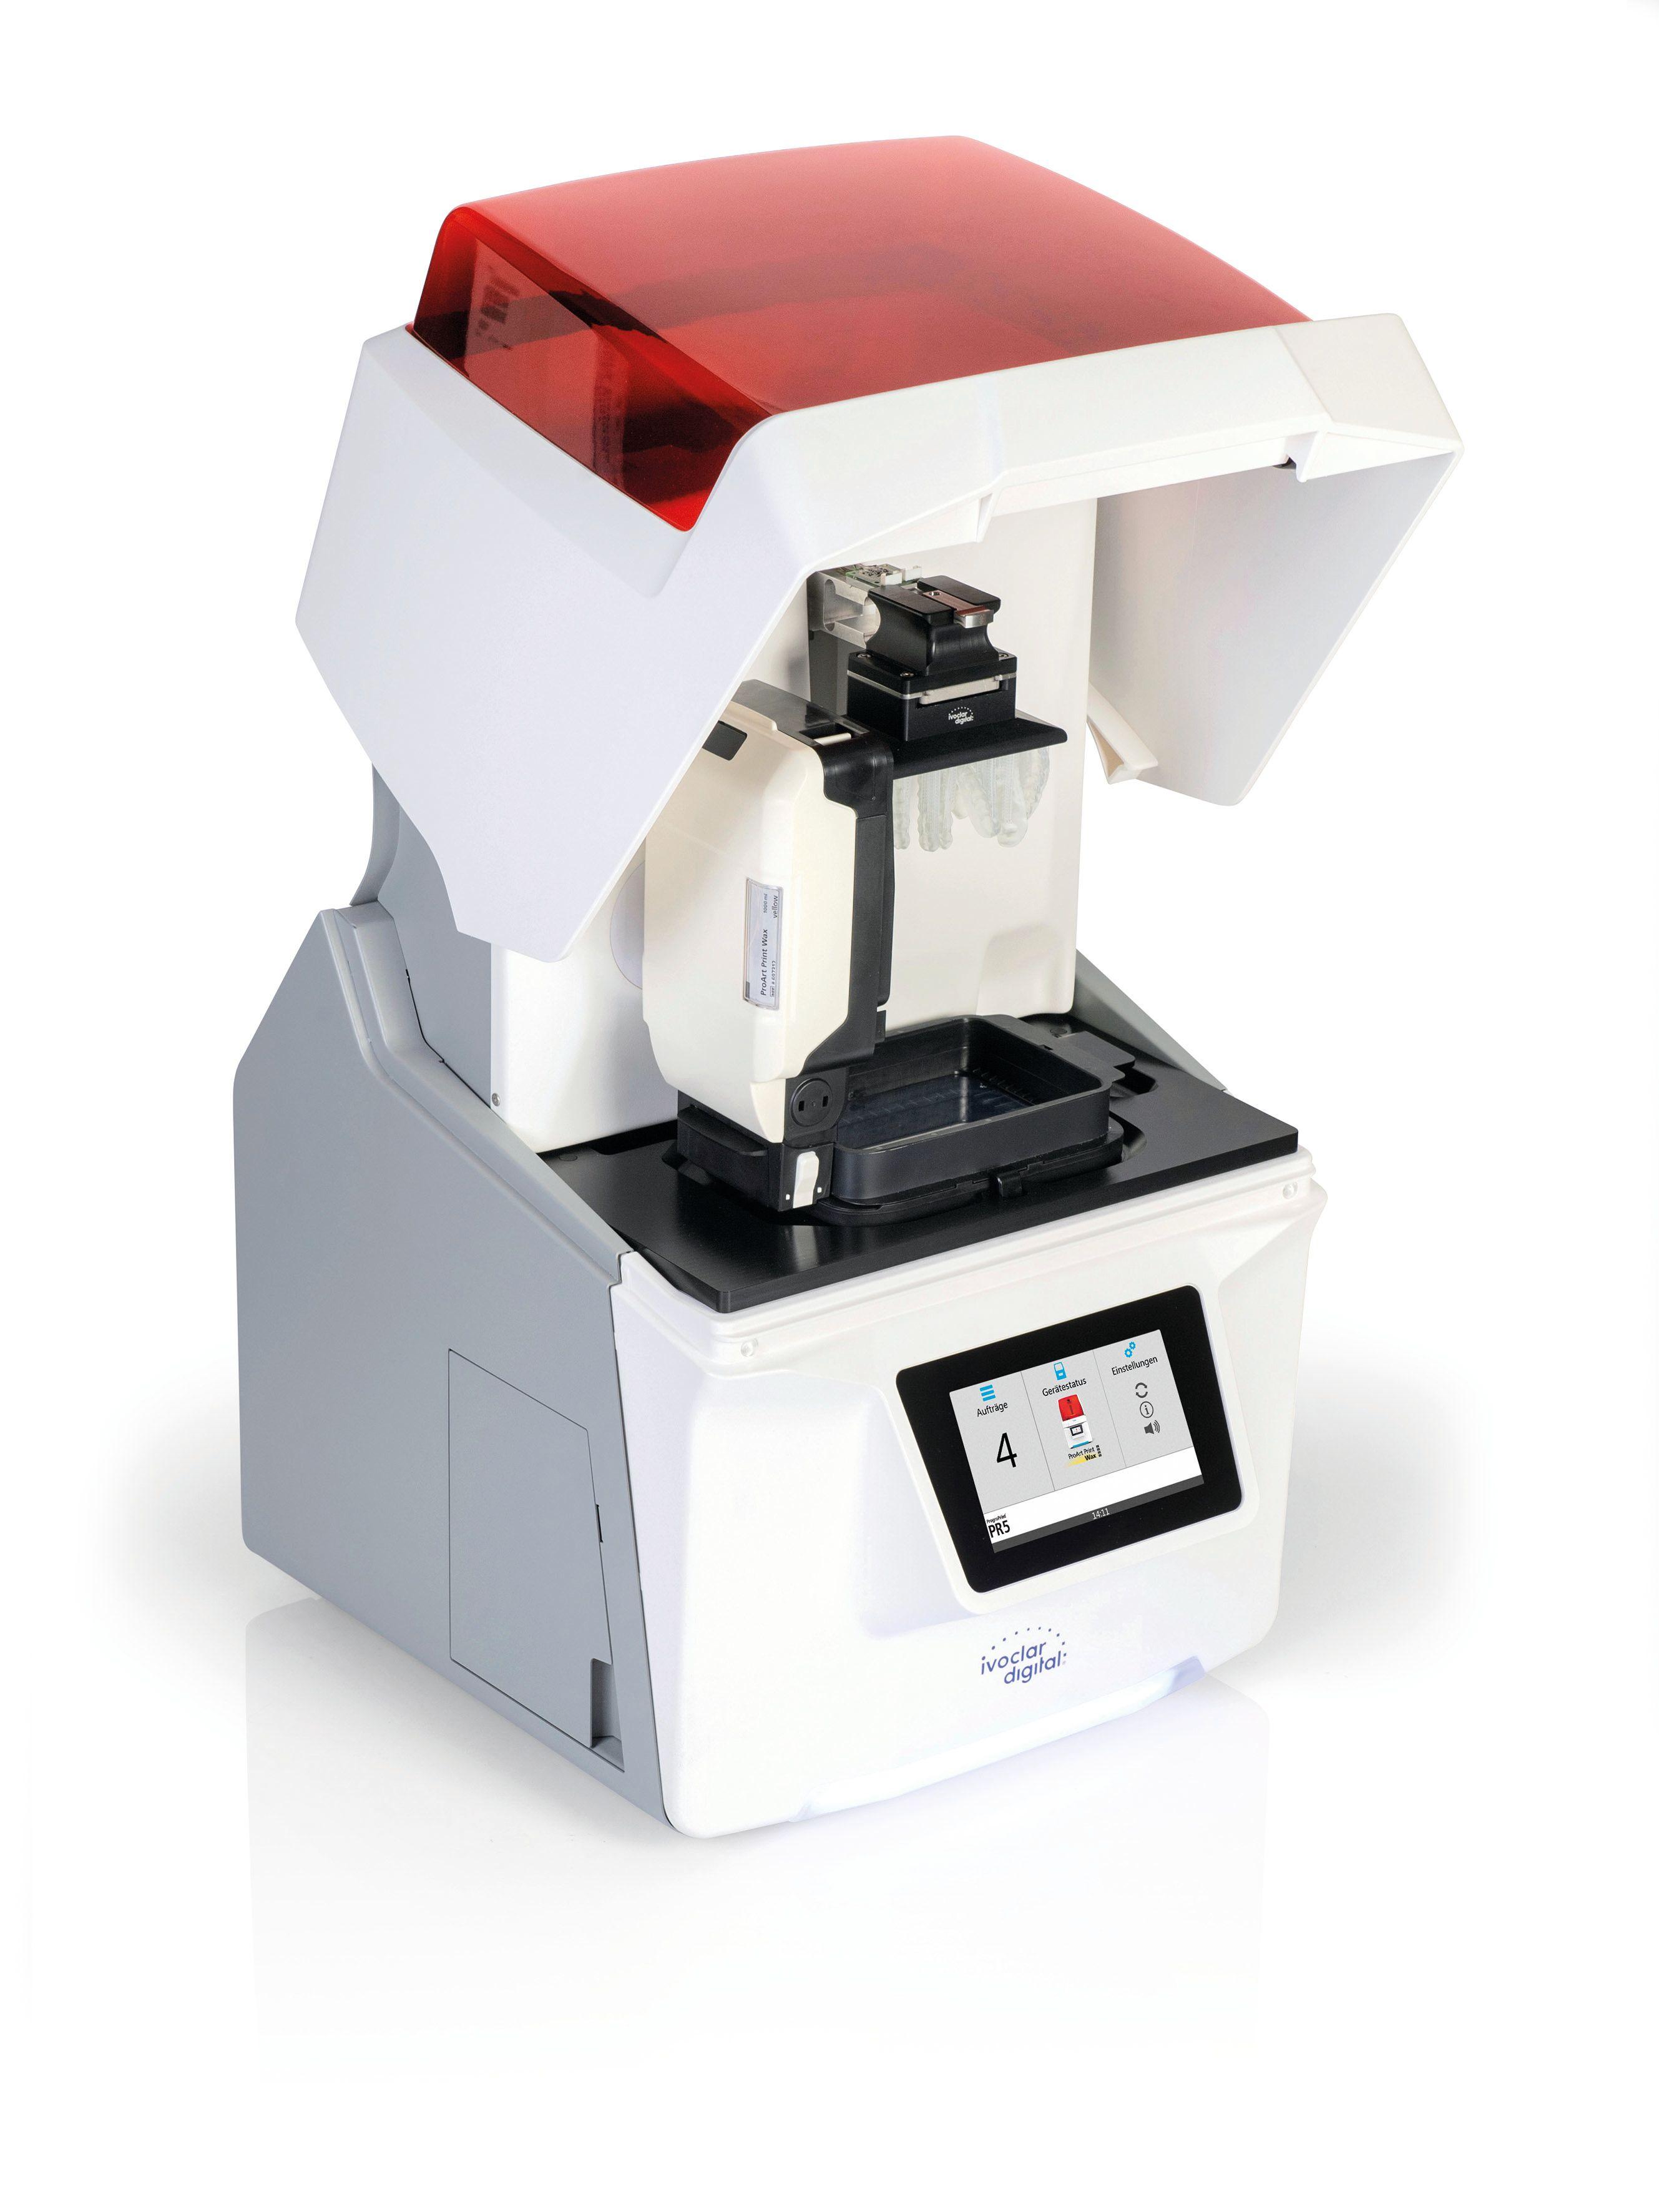 PrograPrinograPrint 3D Print System